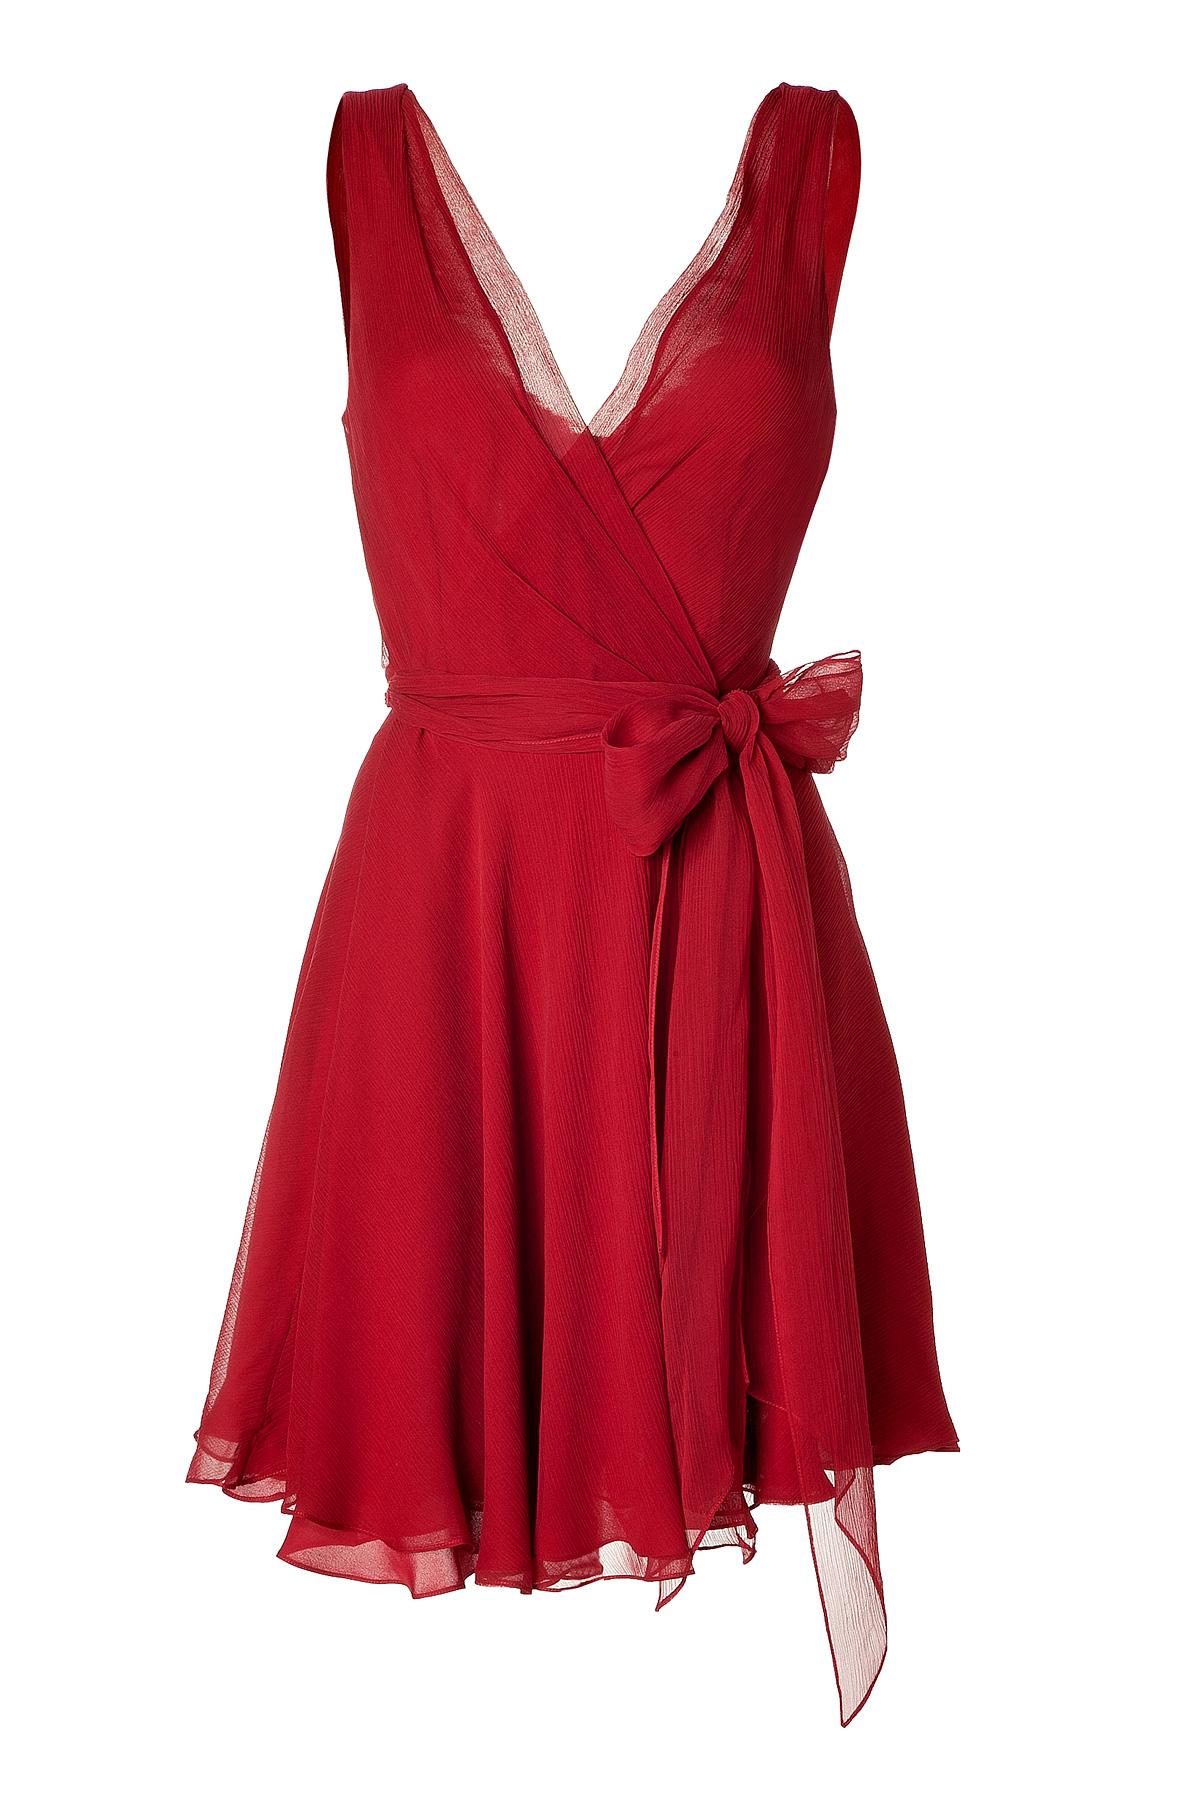 Lyst Ralph Lauren Parisian Red Crinkle Silk Chiffon